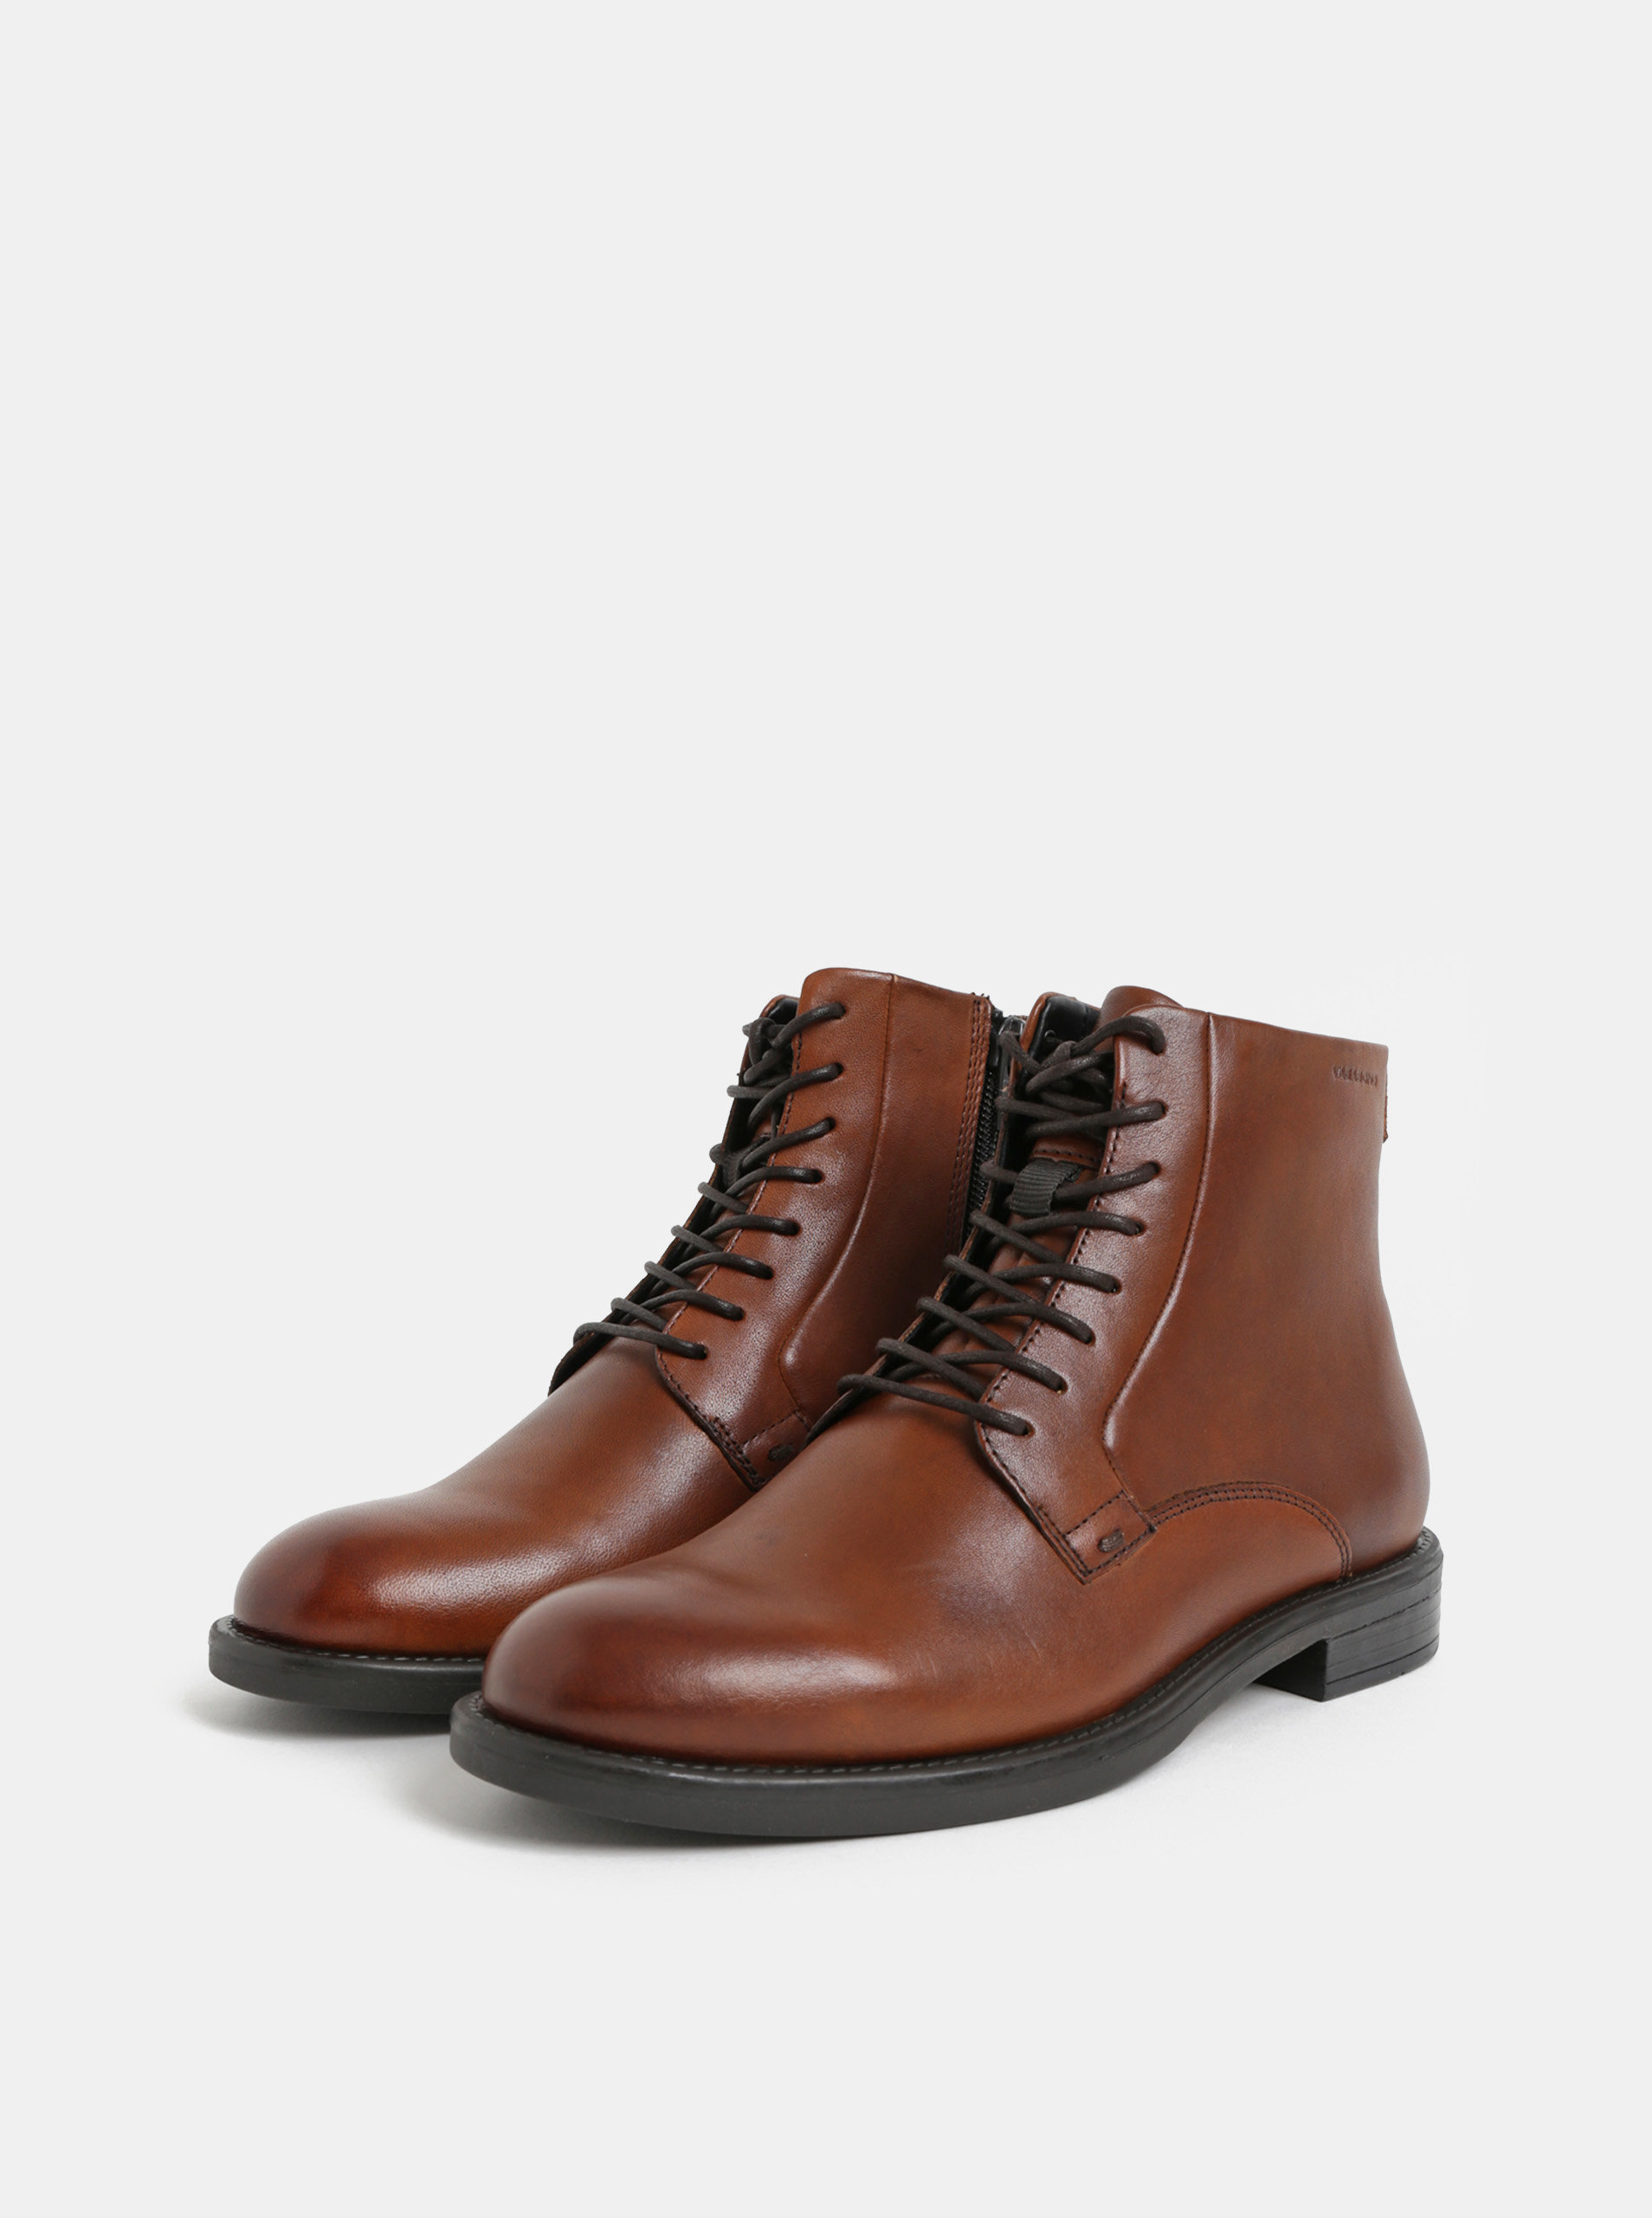 c851164dd89 Hnědé dámské kožené kotníkové boty Vagabond Amina ...